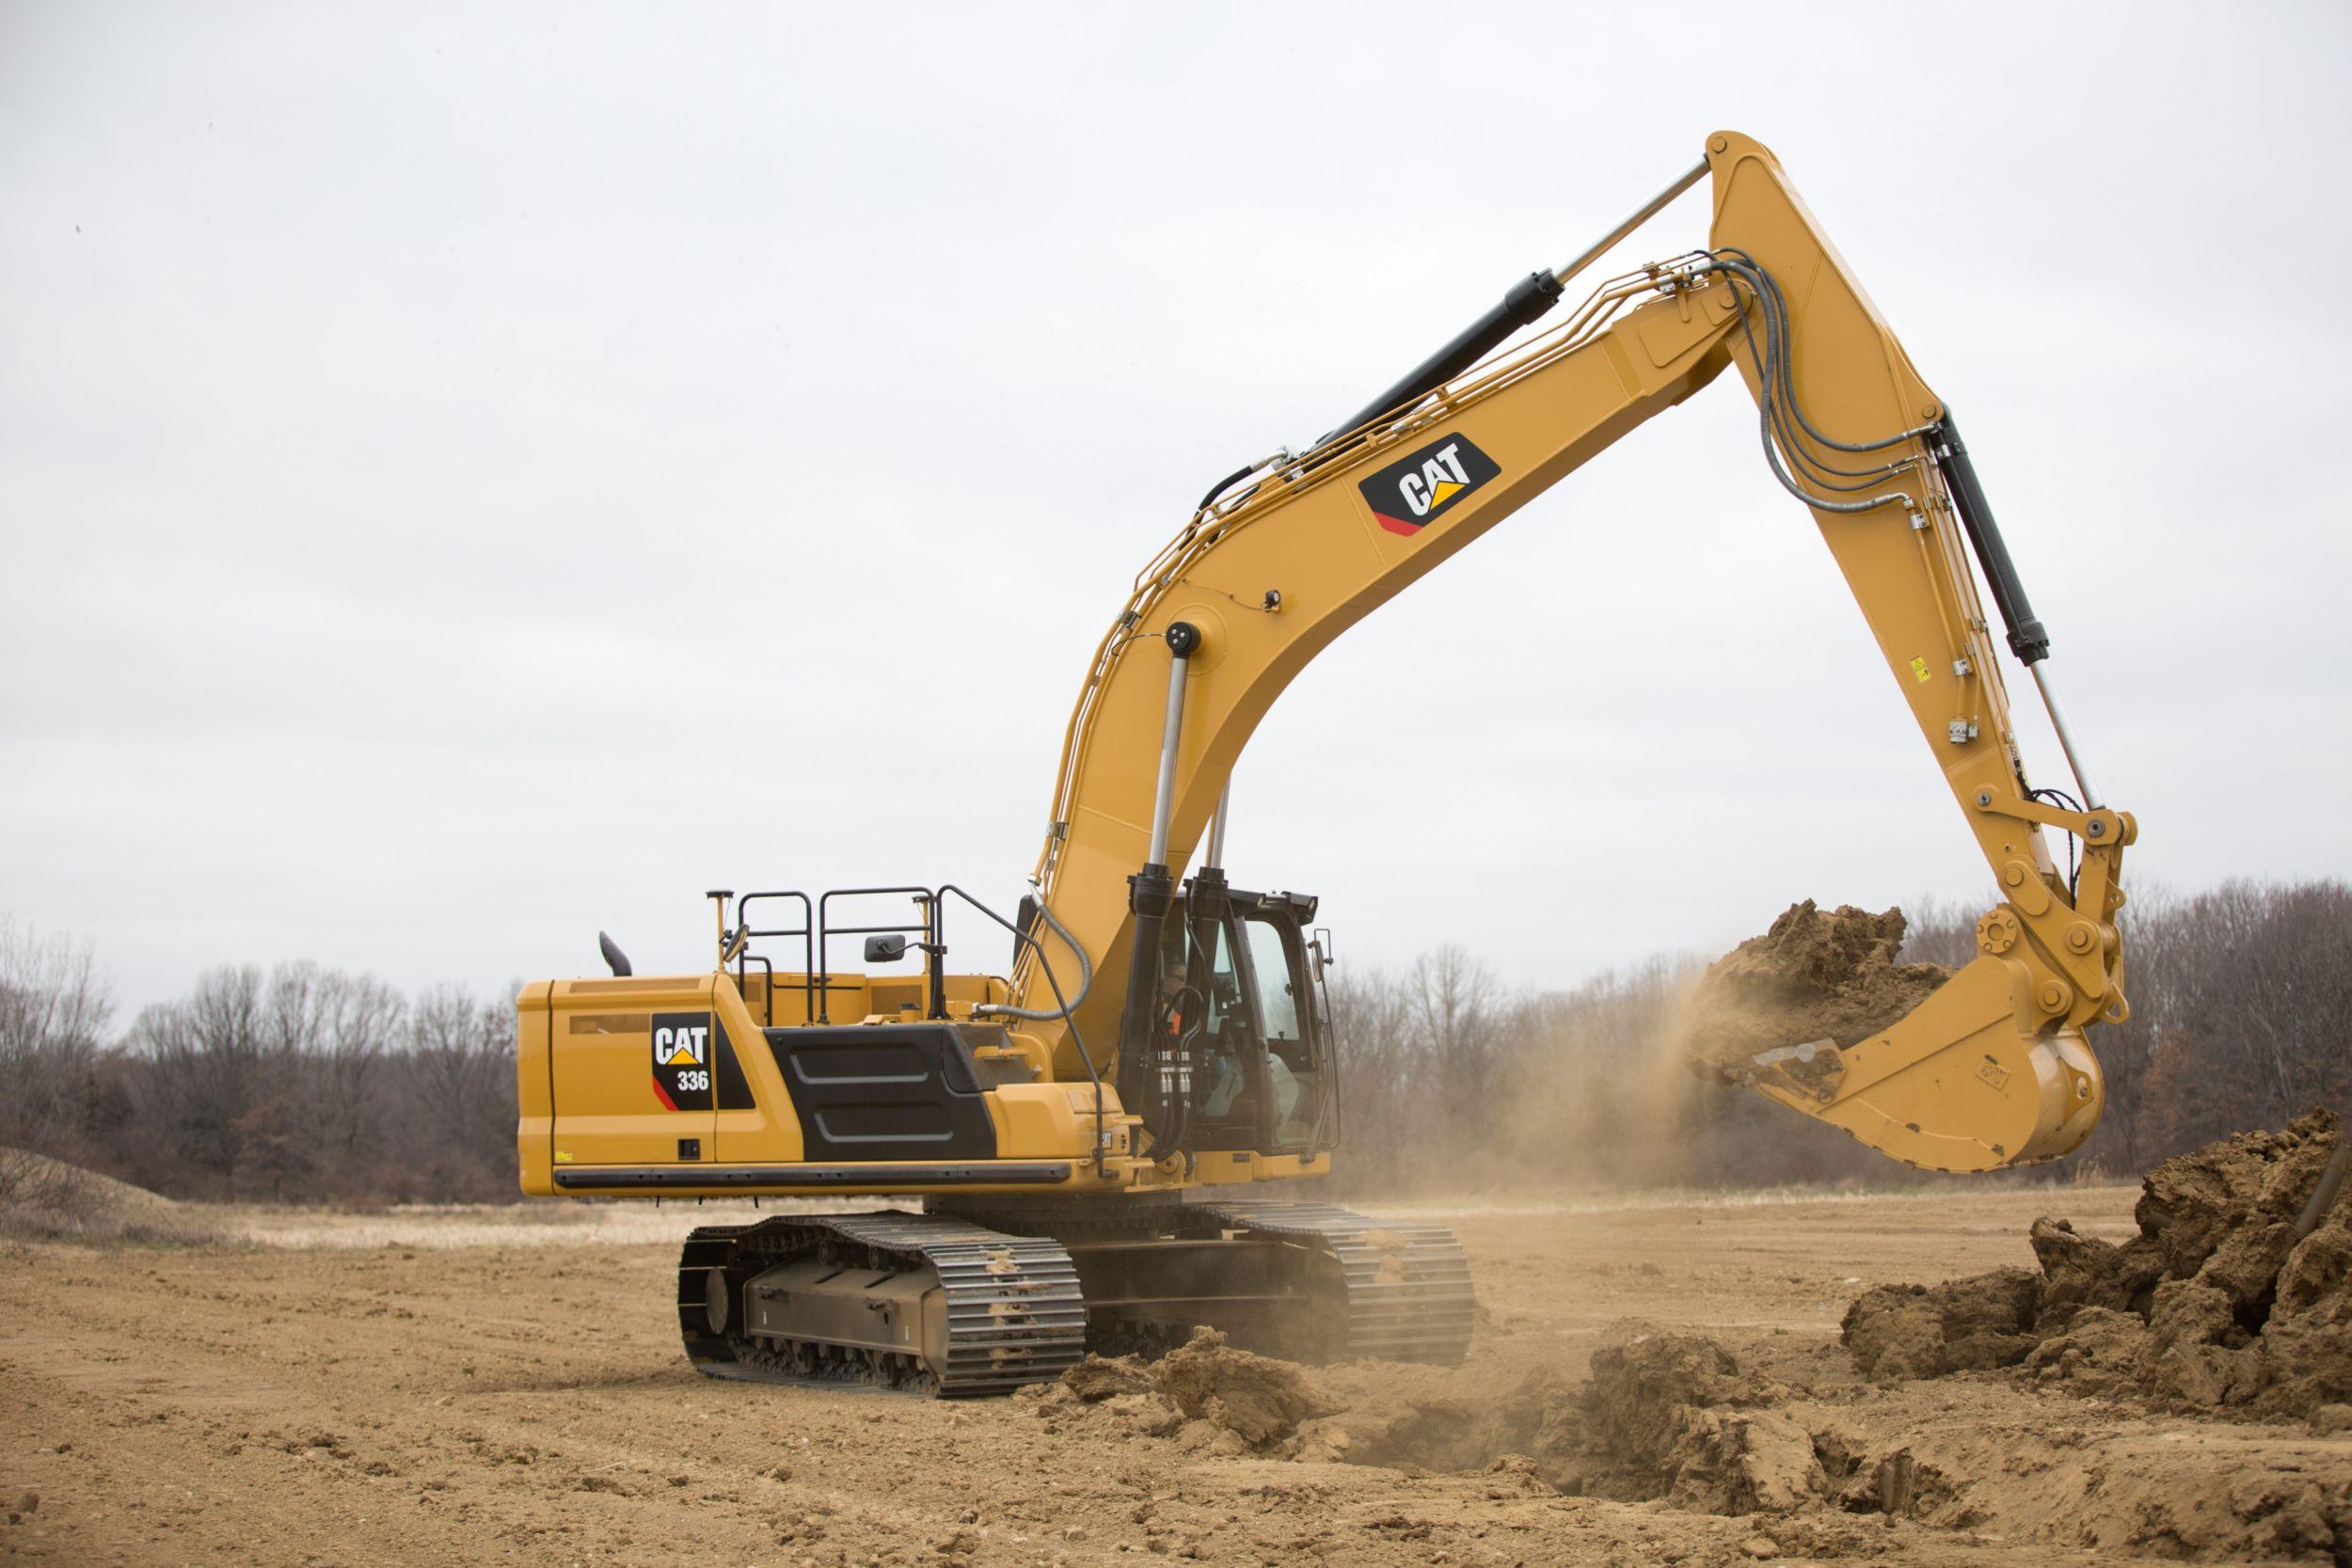 336 Hydraulic Excavator>